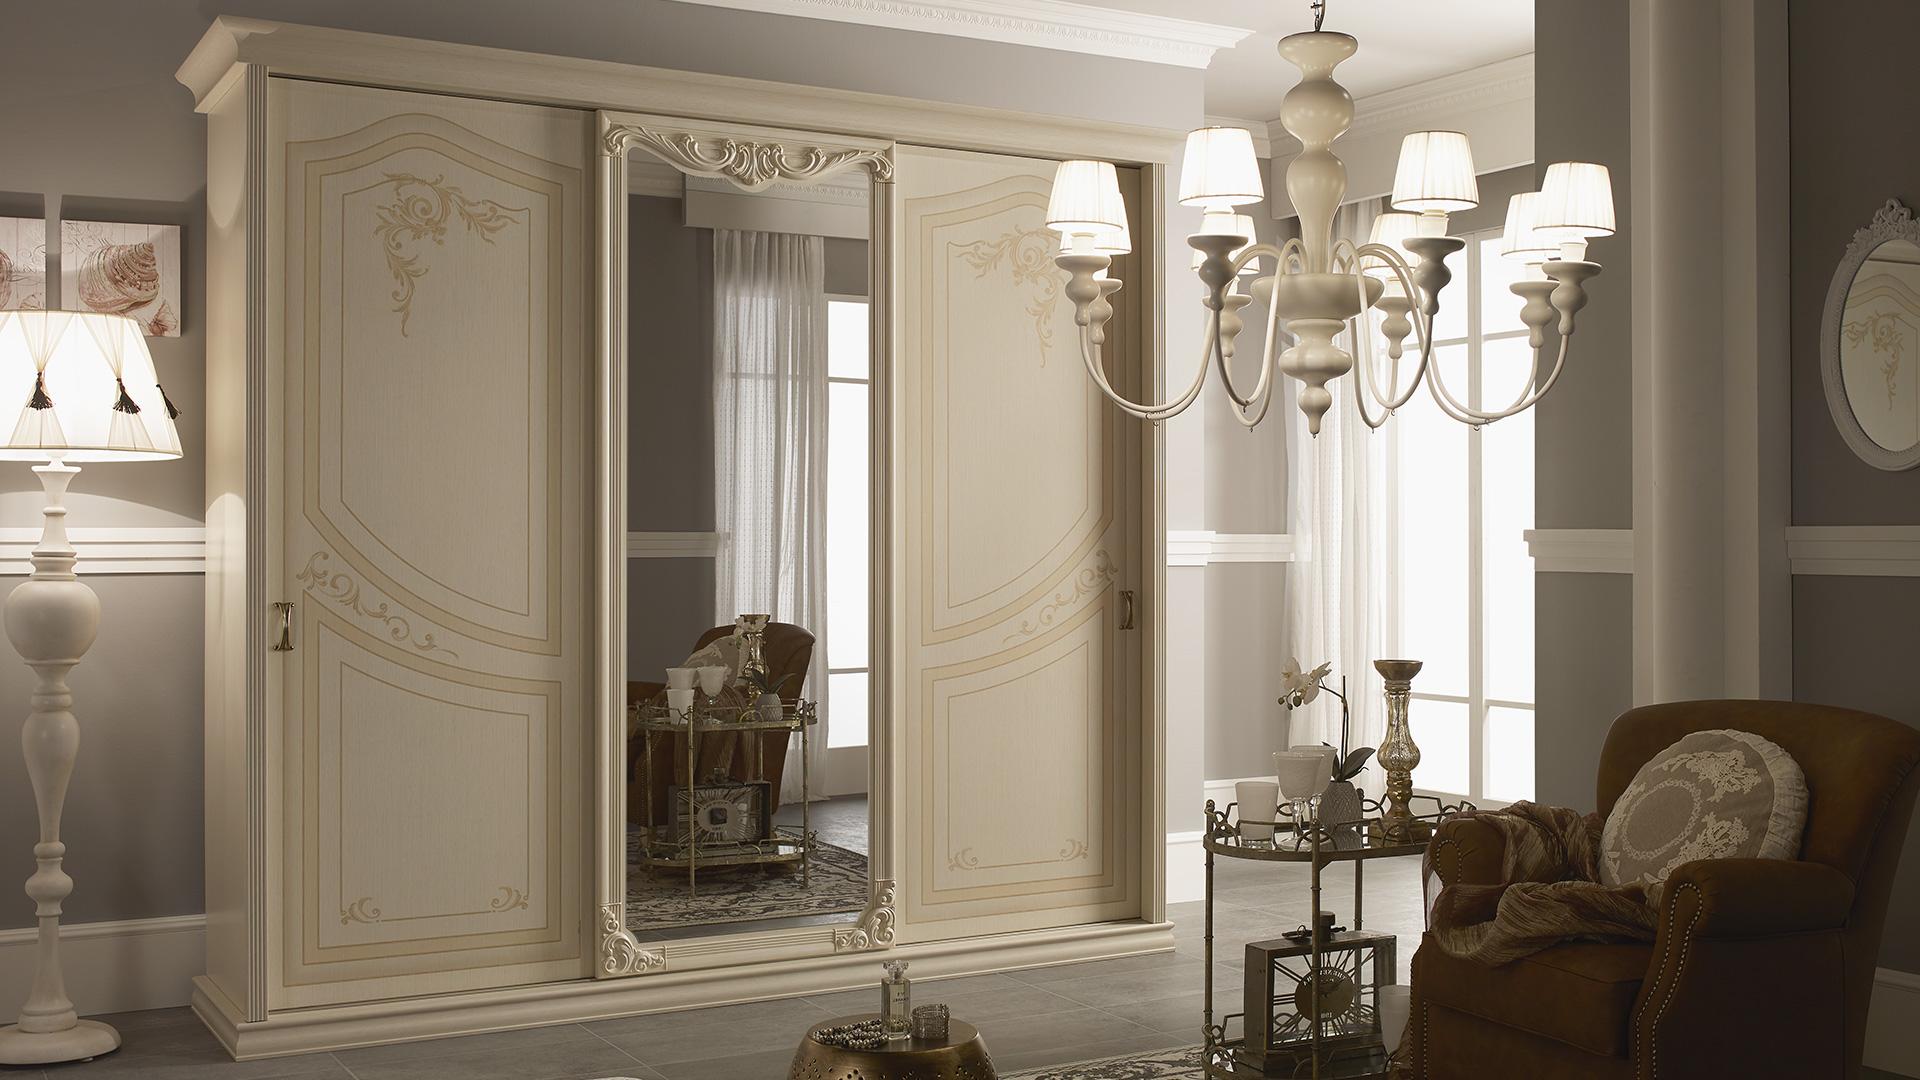 barocco 3 trg kleiderschrank yuvam m belhaus in wuppertal cilek offizieller h ndler in europa. Black Bedroom Furniture Sets. Home Design Ideas